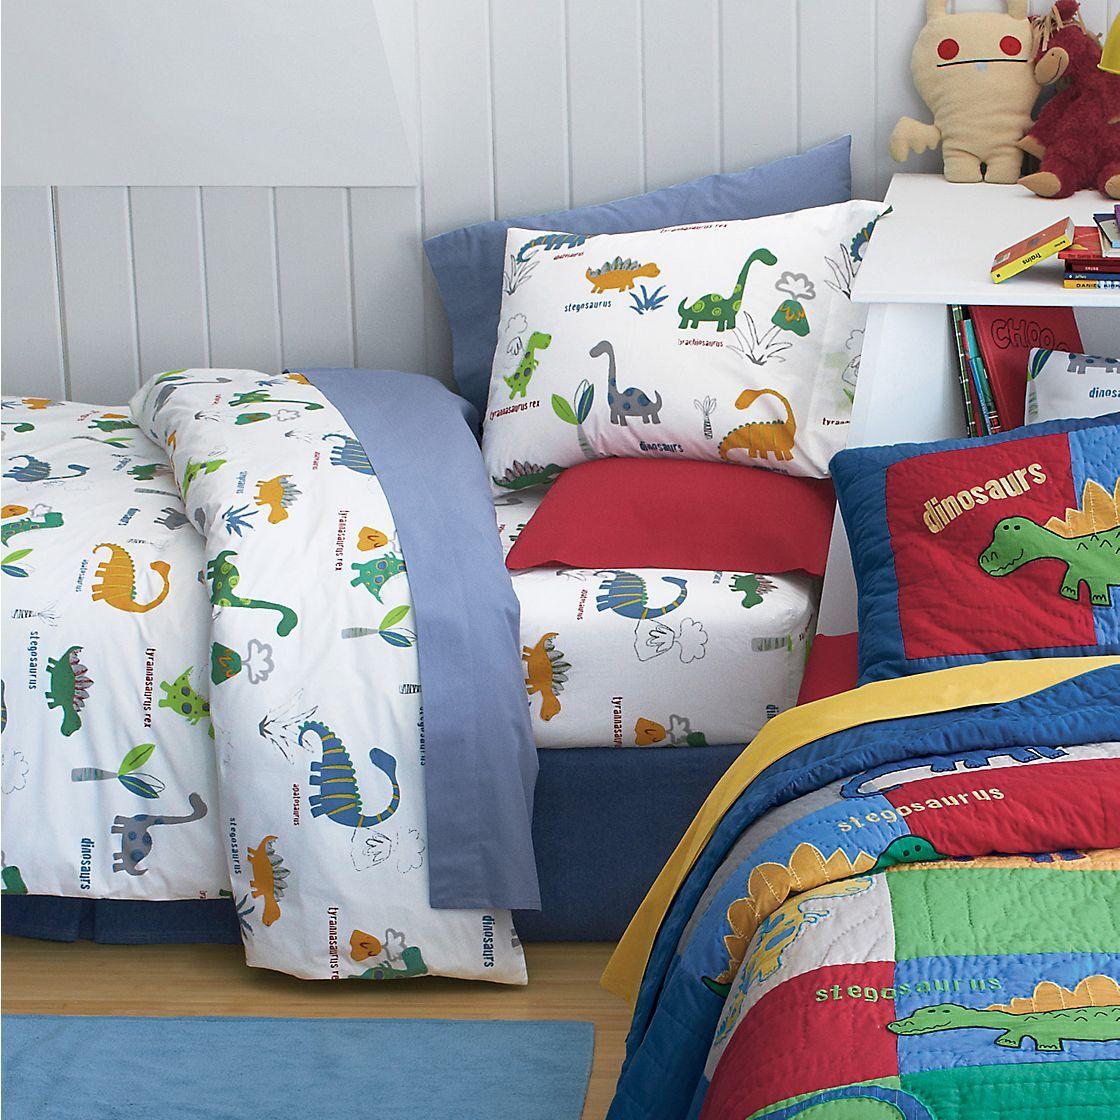 Boys dinosaur bedroom ideas companystore for Dinosaur bedroom ideas boys